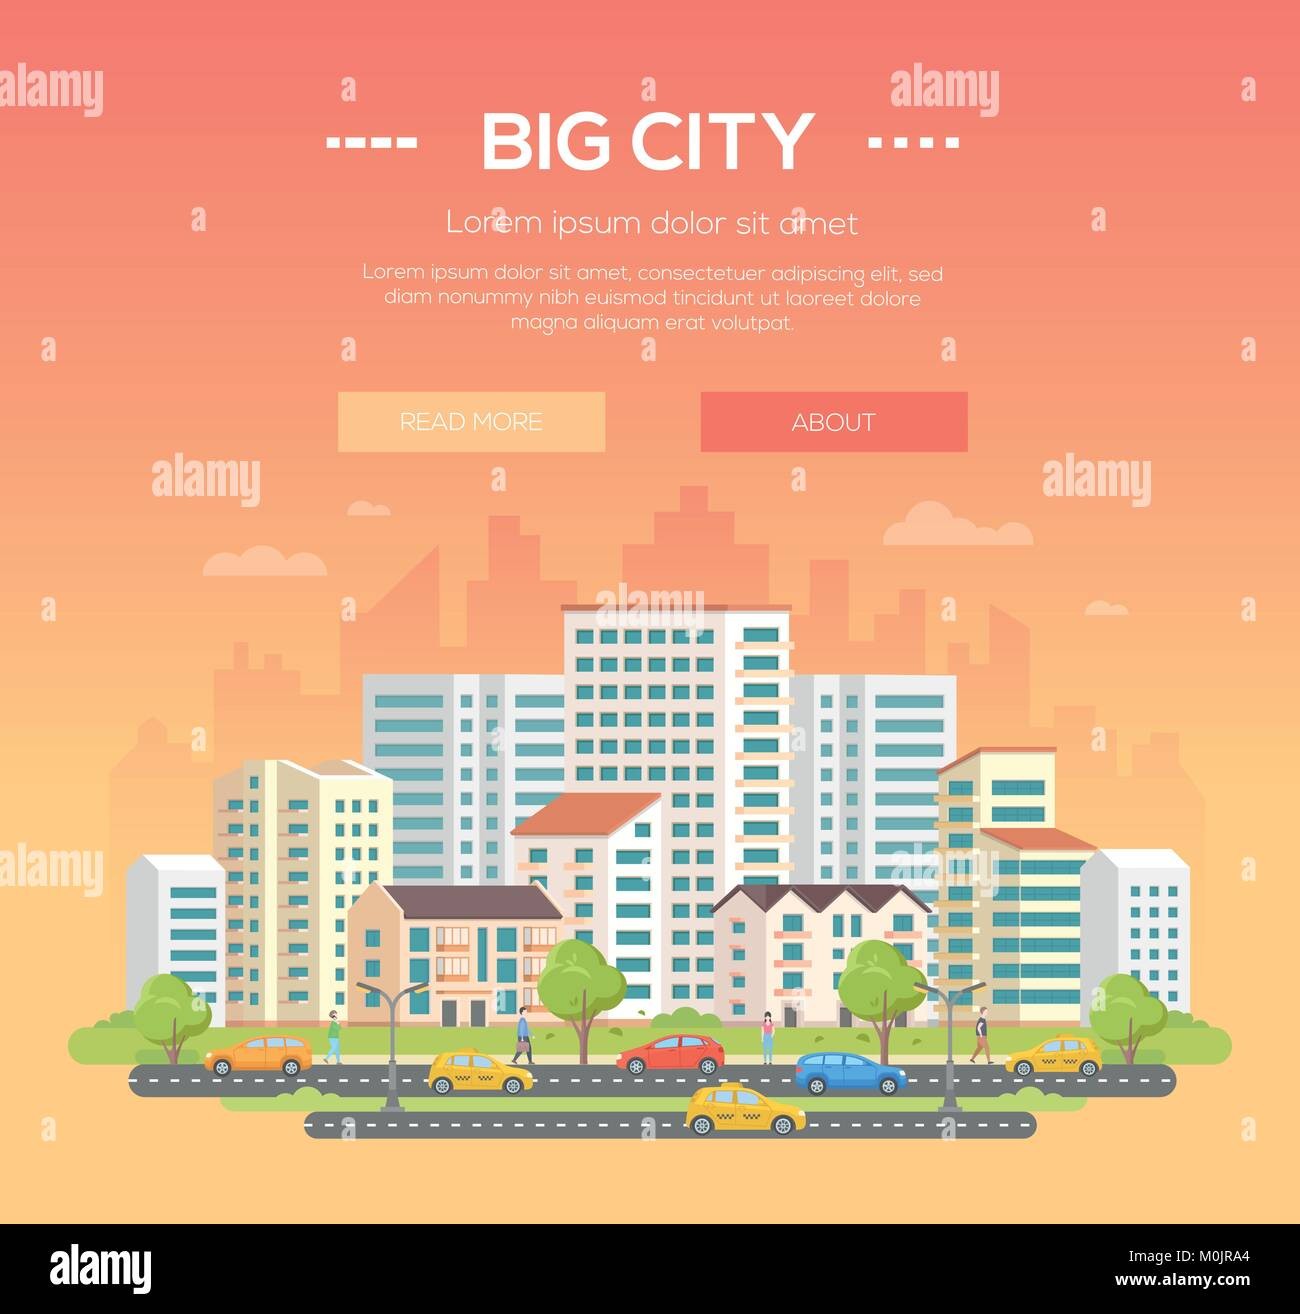 Big city - modern colorful vector illustration - Stock Vector